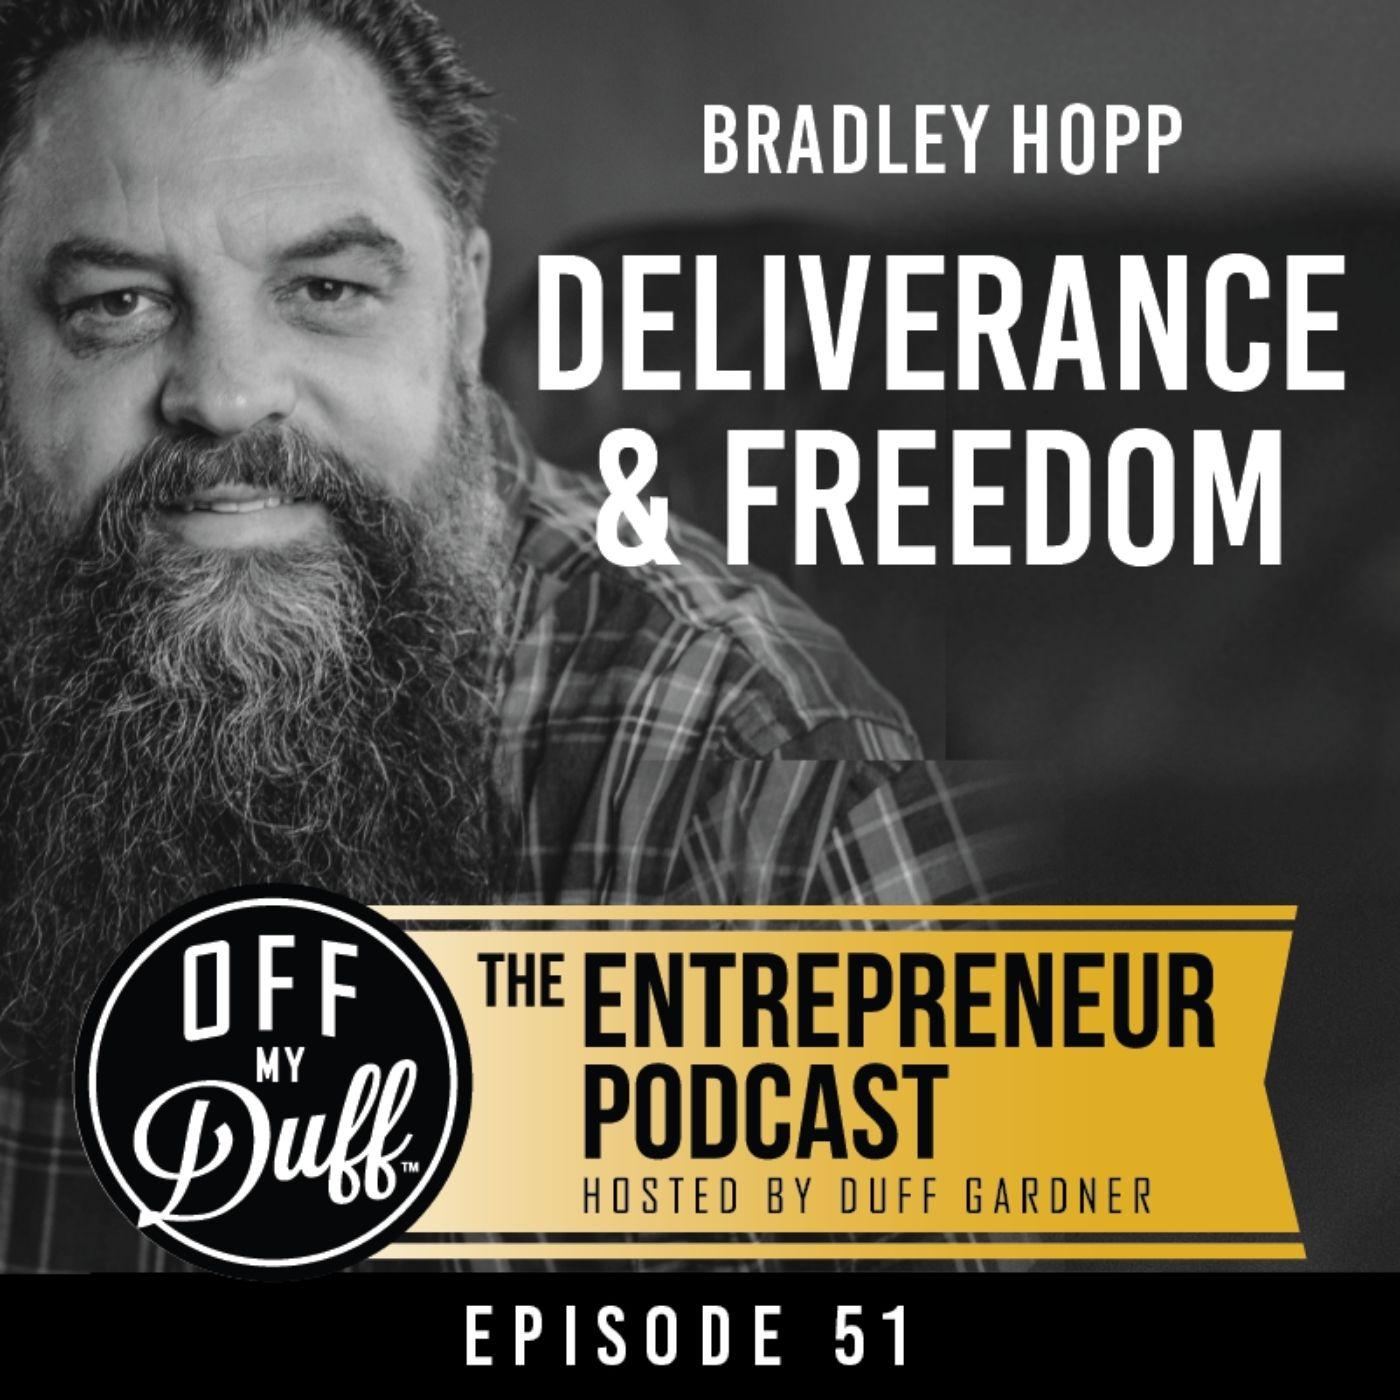 Bradley Hopp - Deliverance & Freedom